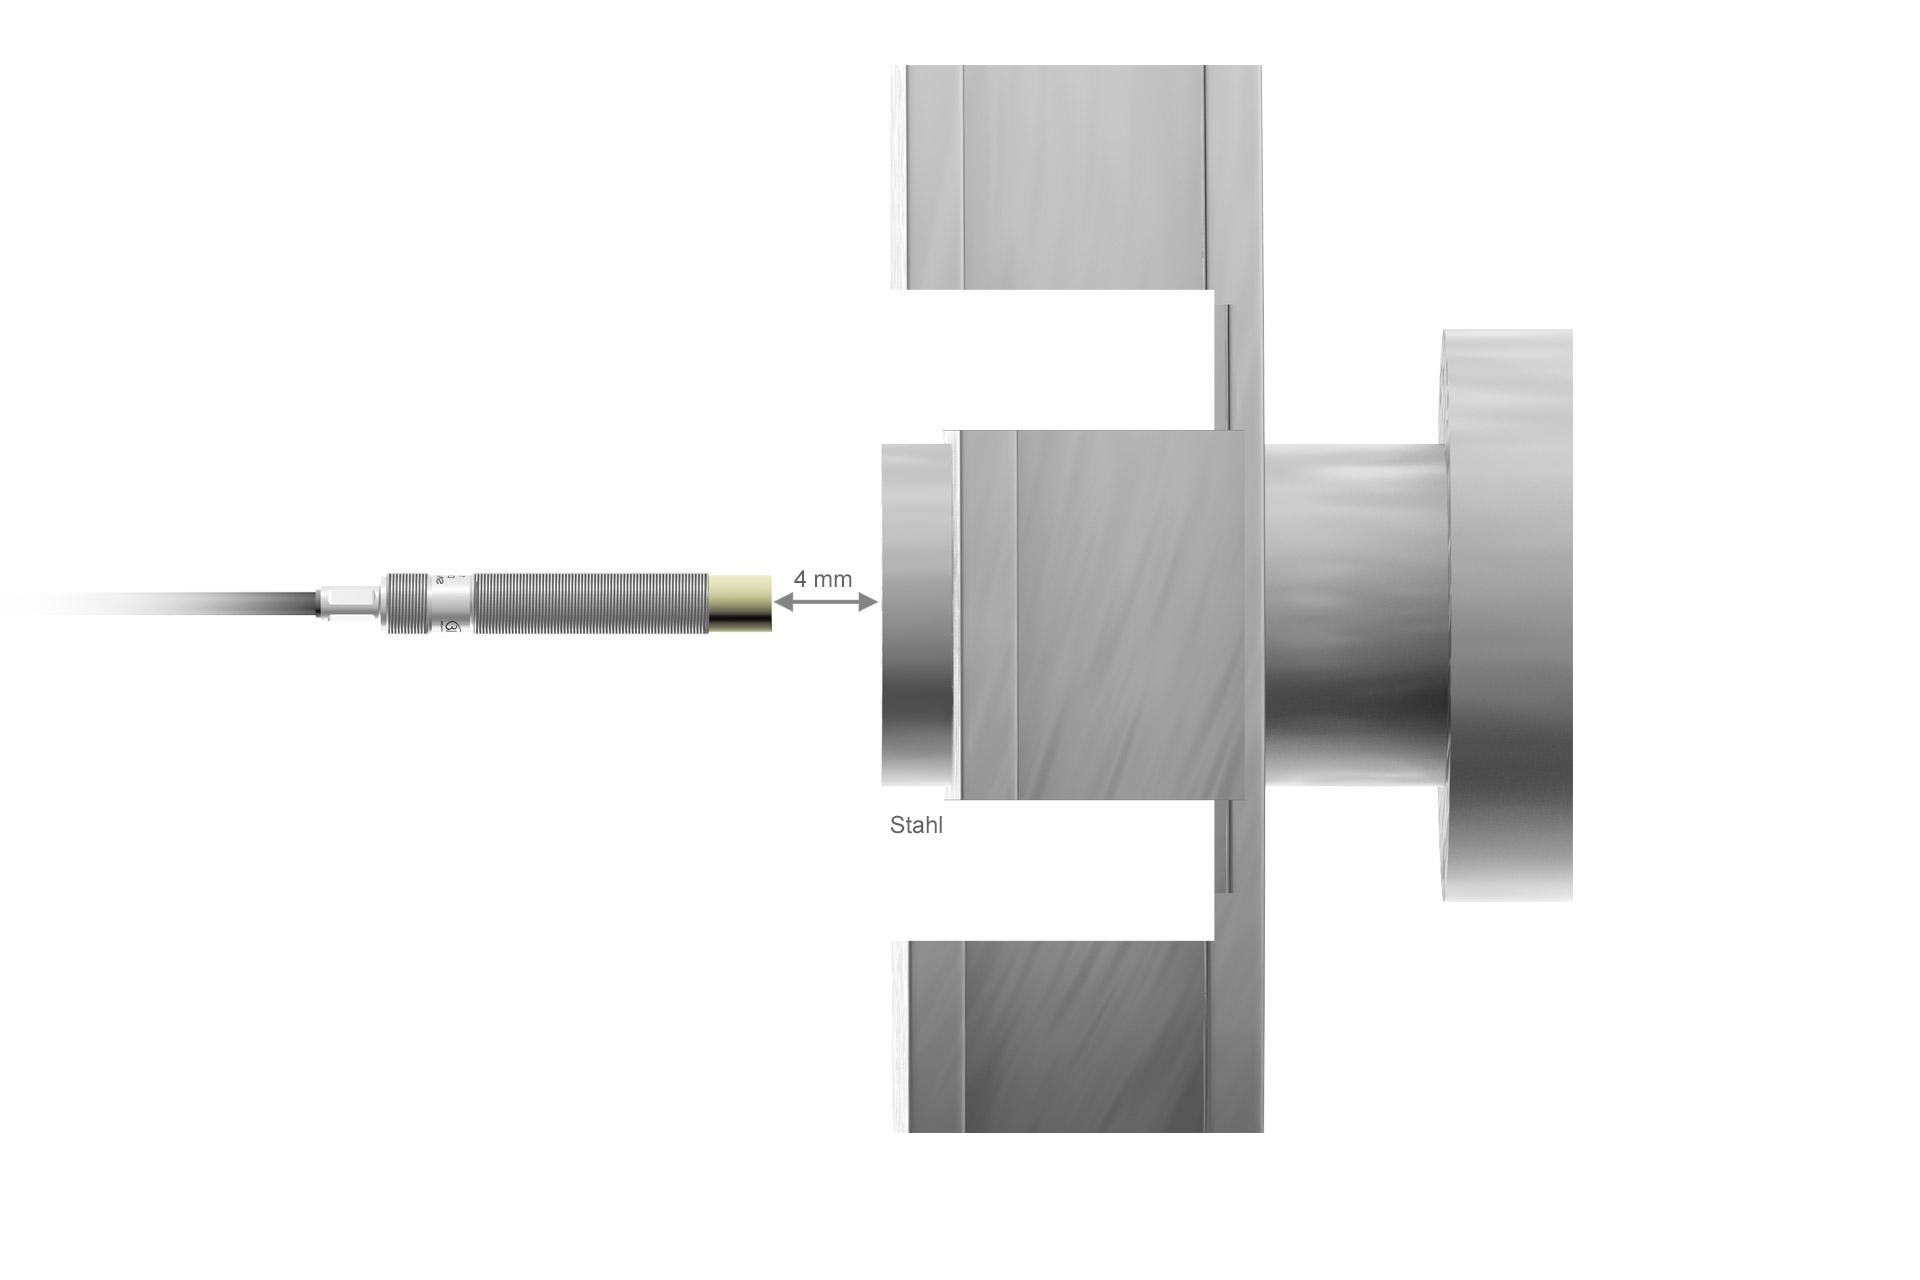 DT3001-U4-M-C3 Wirbelstrom-Wegsensor